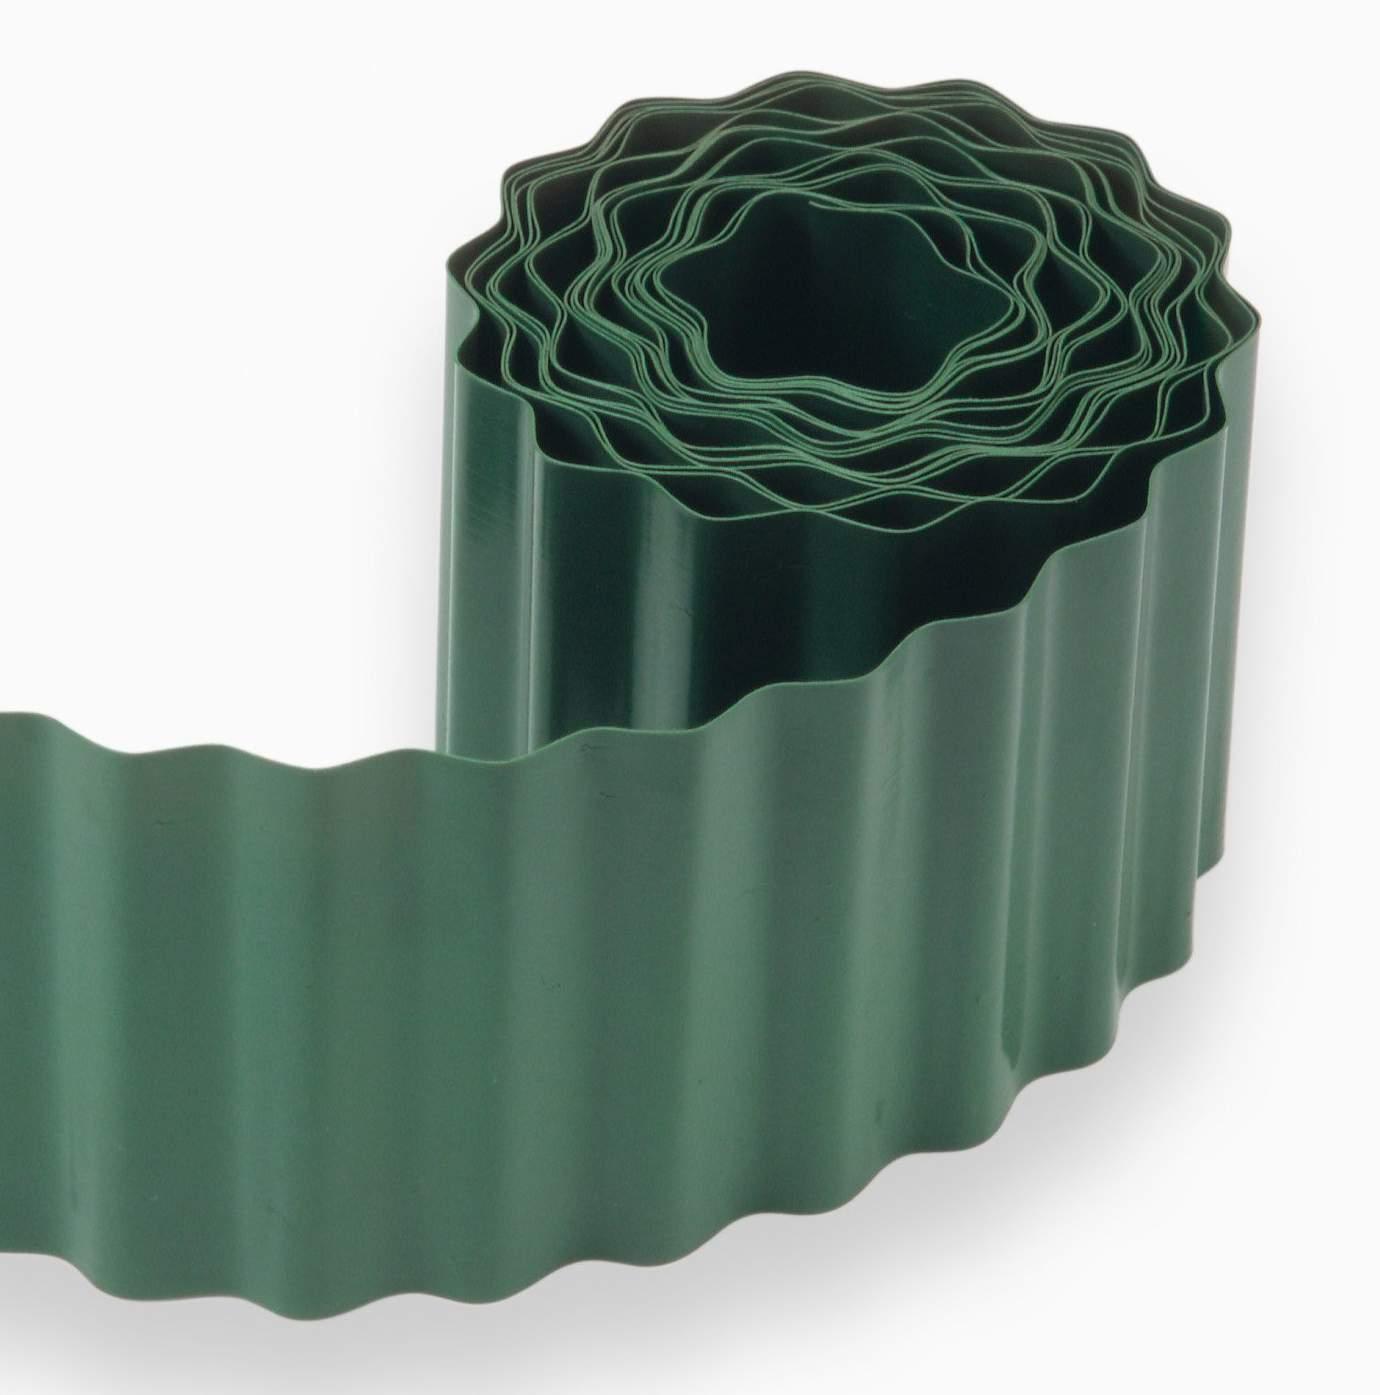 Green Plastic Garden Grass Lawn Edge Edging Border Fence Wall Roll Choose Siz